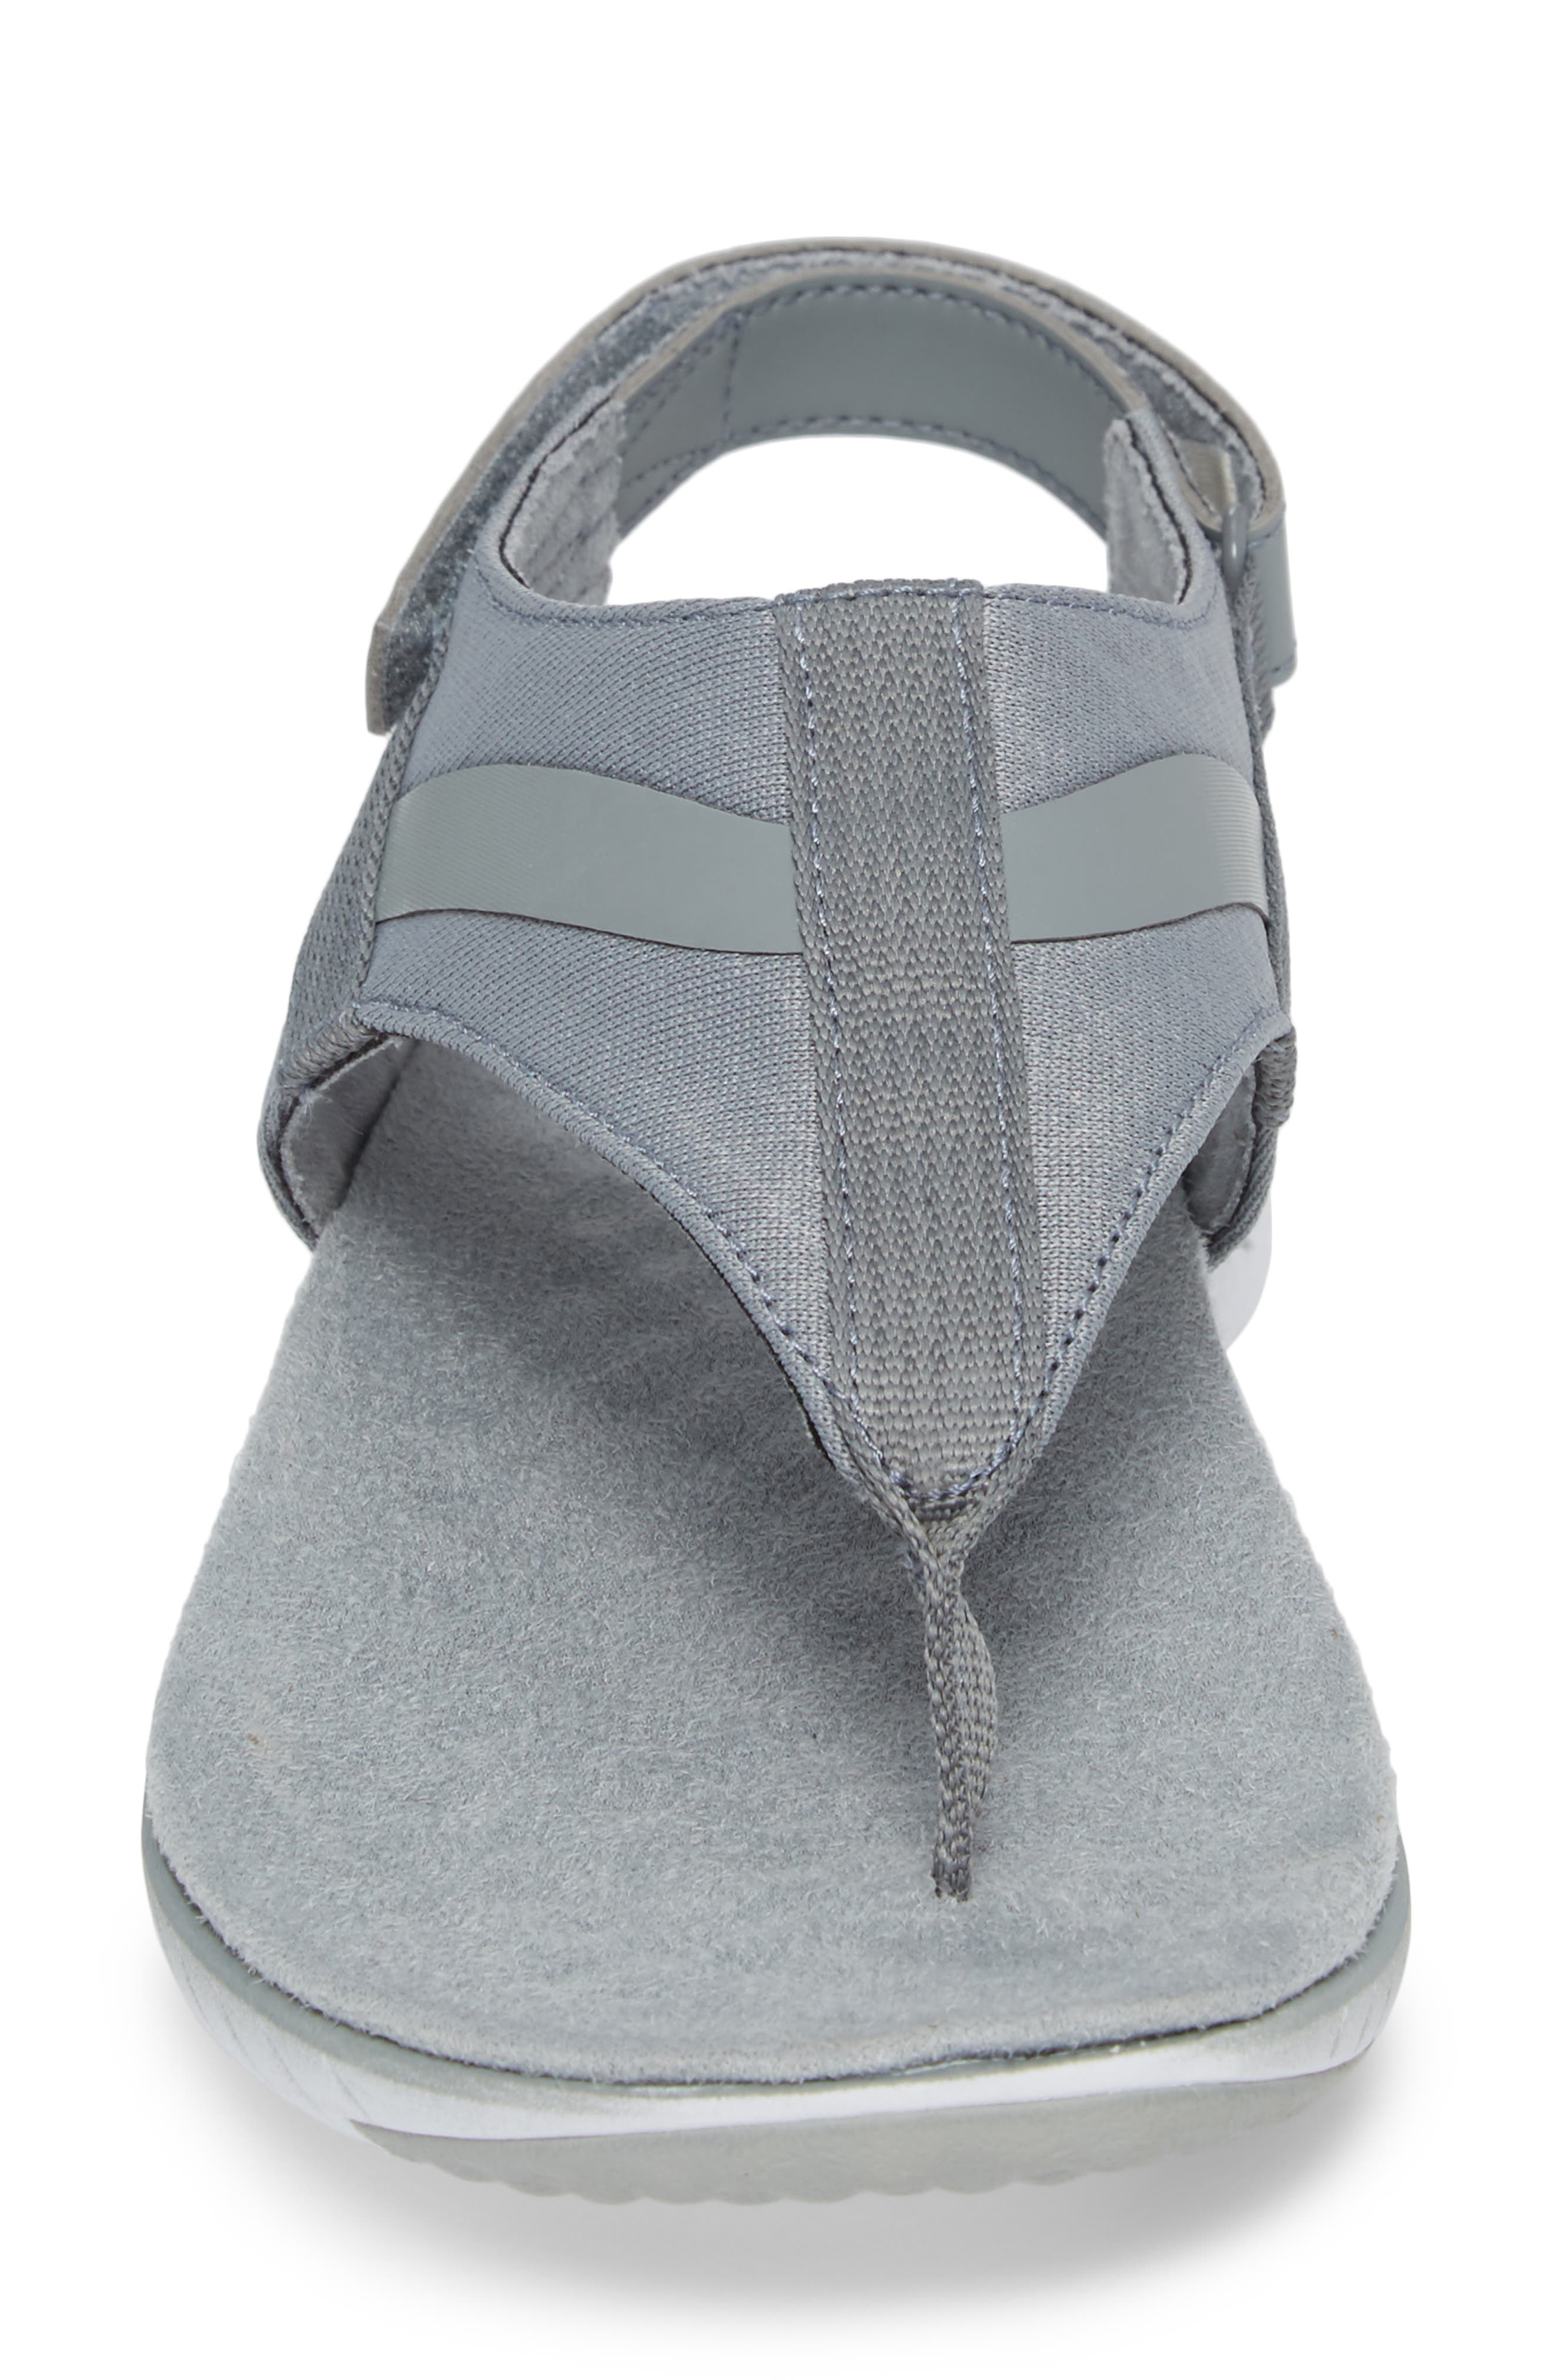 1SIX8 Linna Slide Air Cushion+ Sandal,                             Alternate thumbnail 14, color,